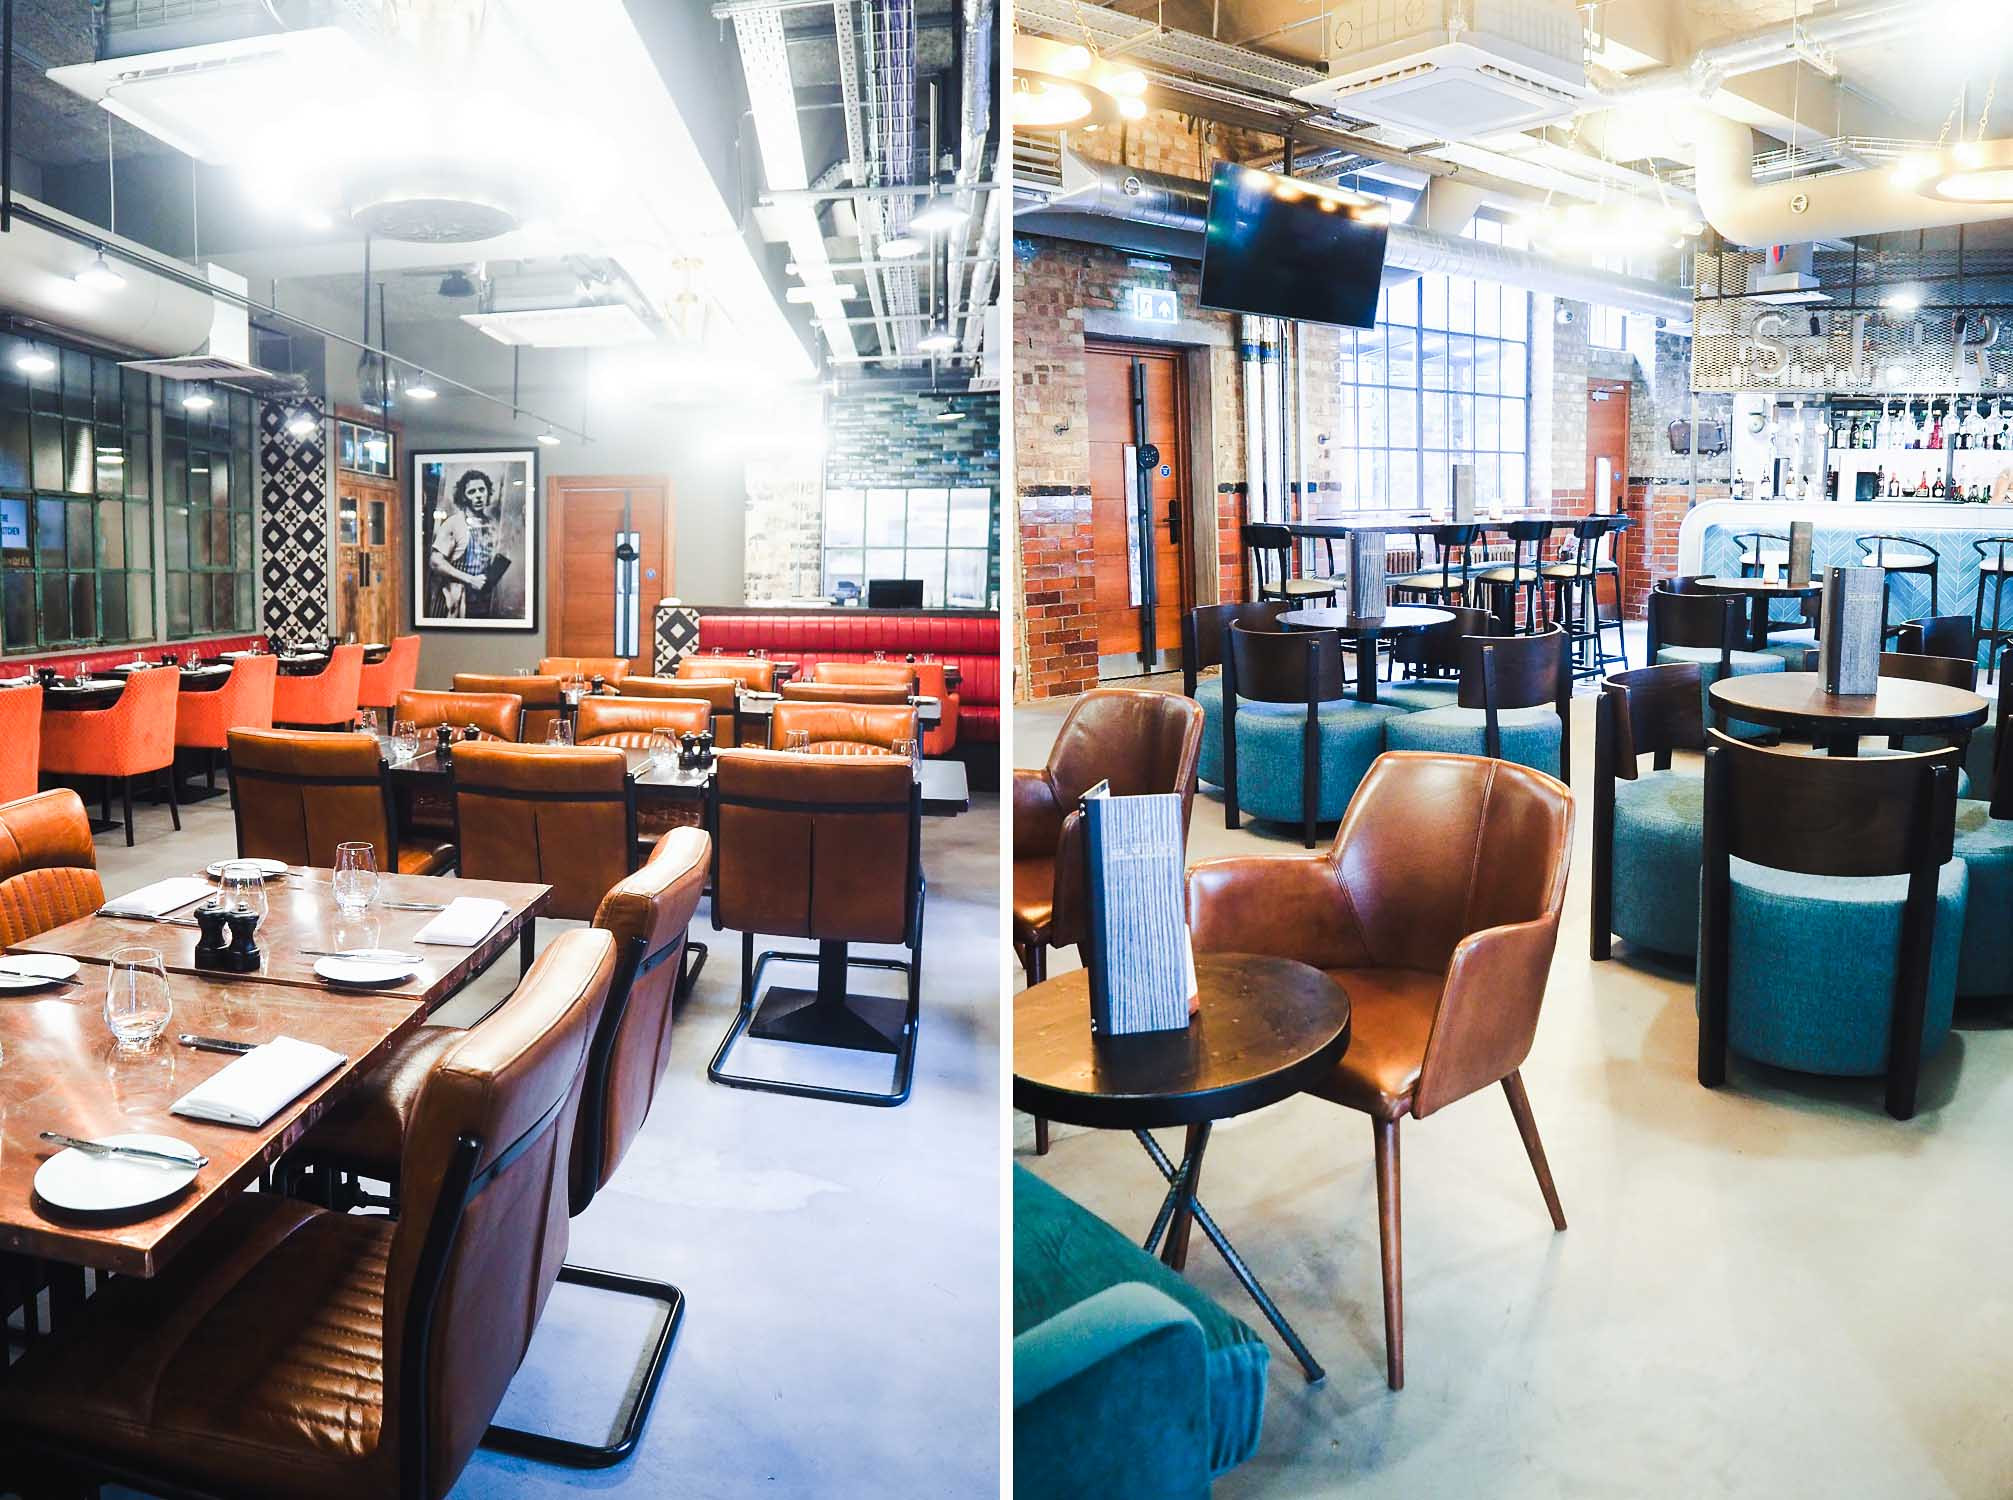 Mr White's English Chophouse restaurant at New Road Hotel - Whitechapel, East London